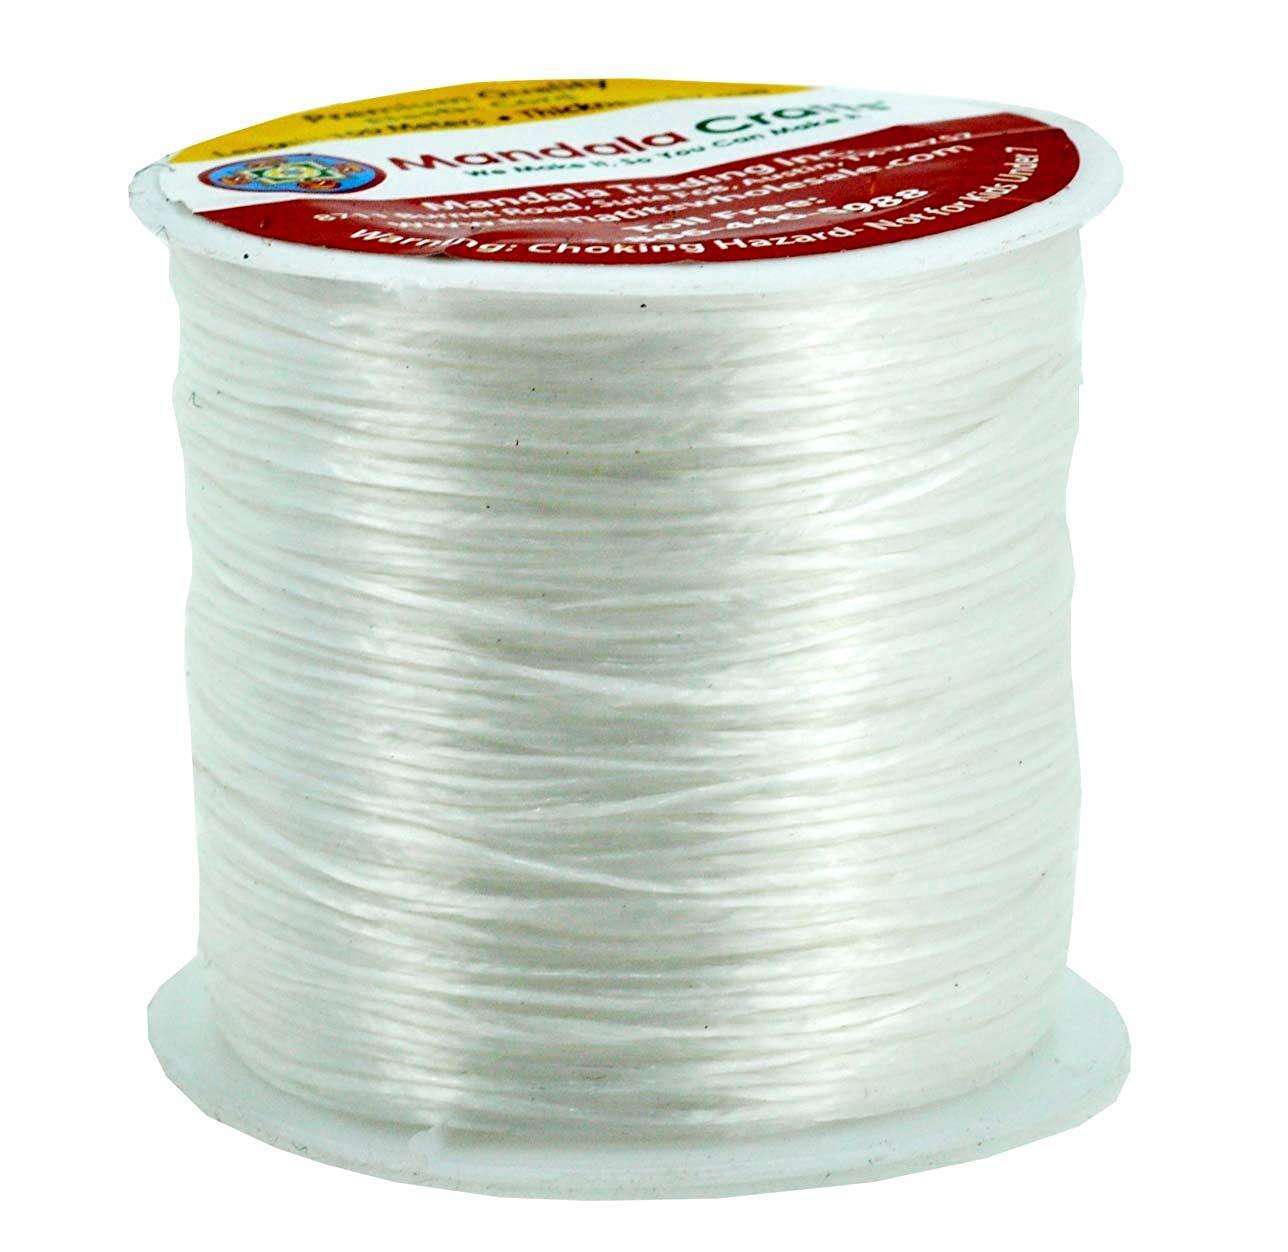 65 Yards Bead String Black Bracelet String Mandala Crafts/Â Elastic Crystal String 0.6mm